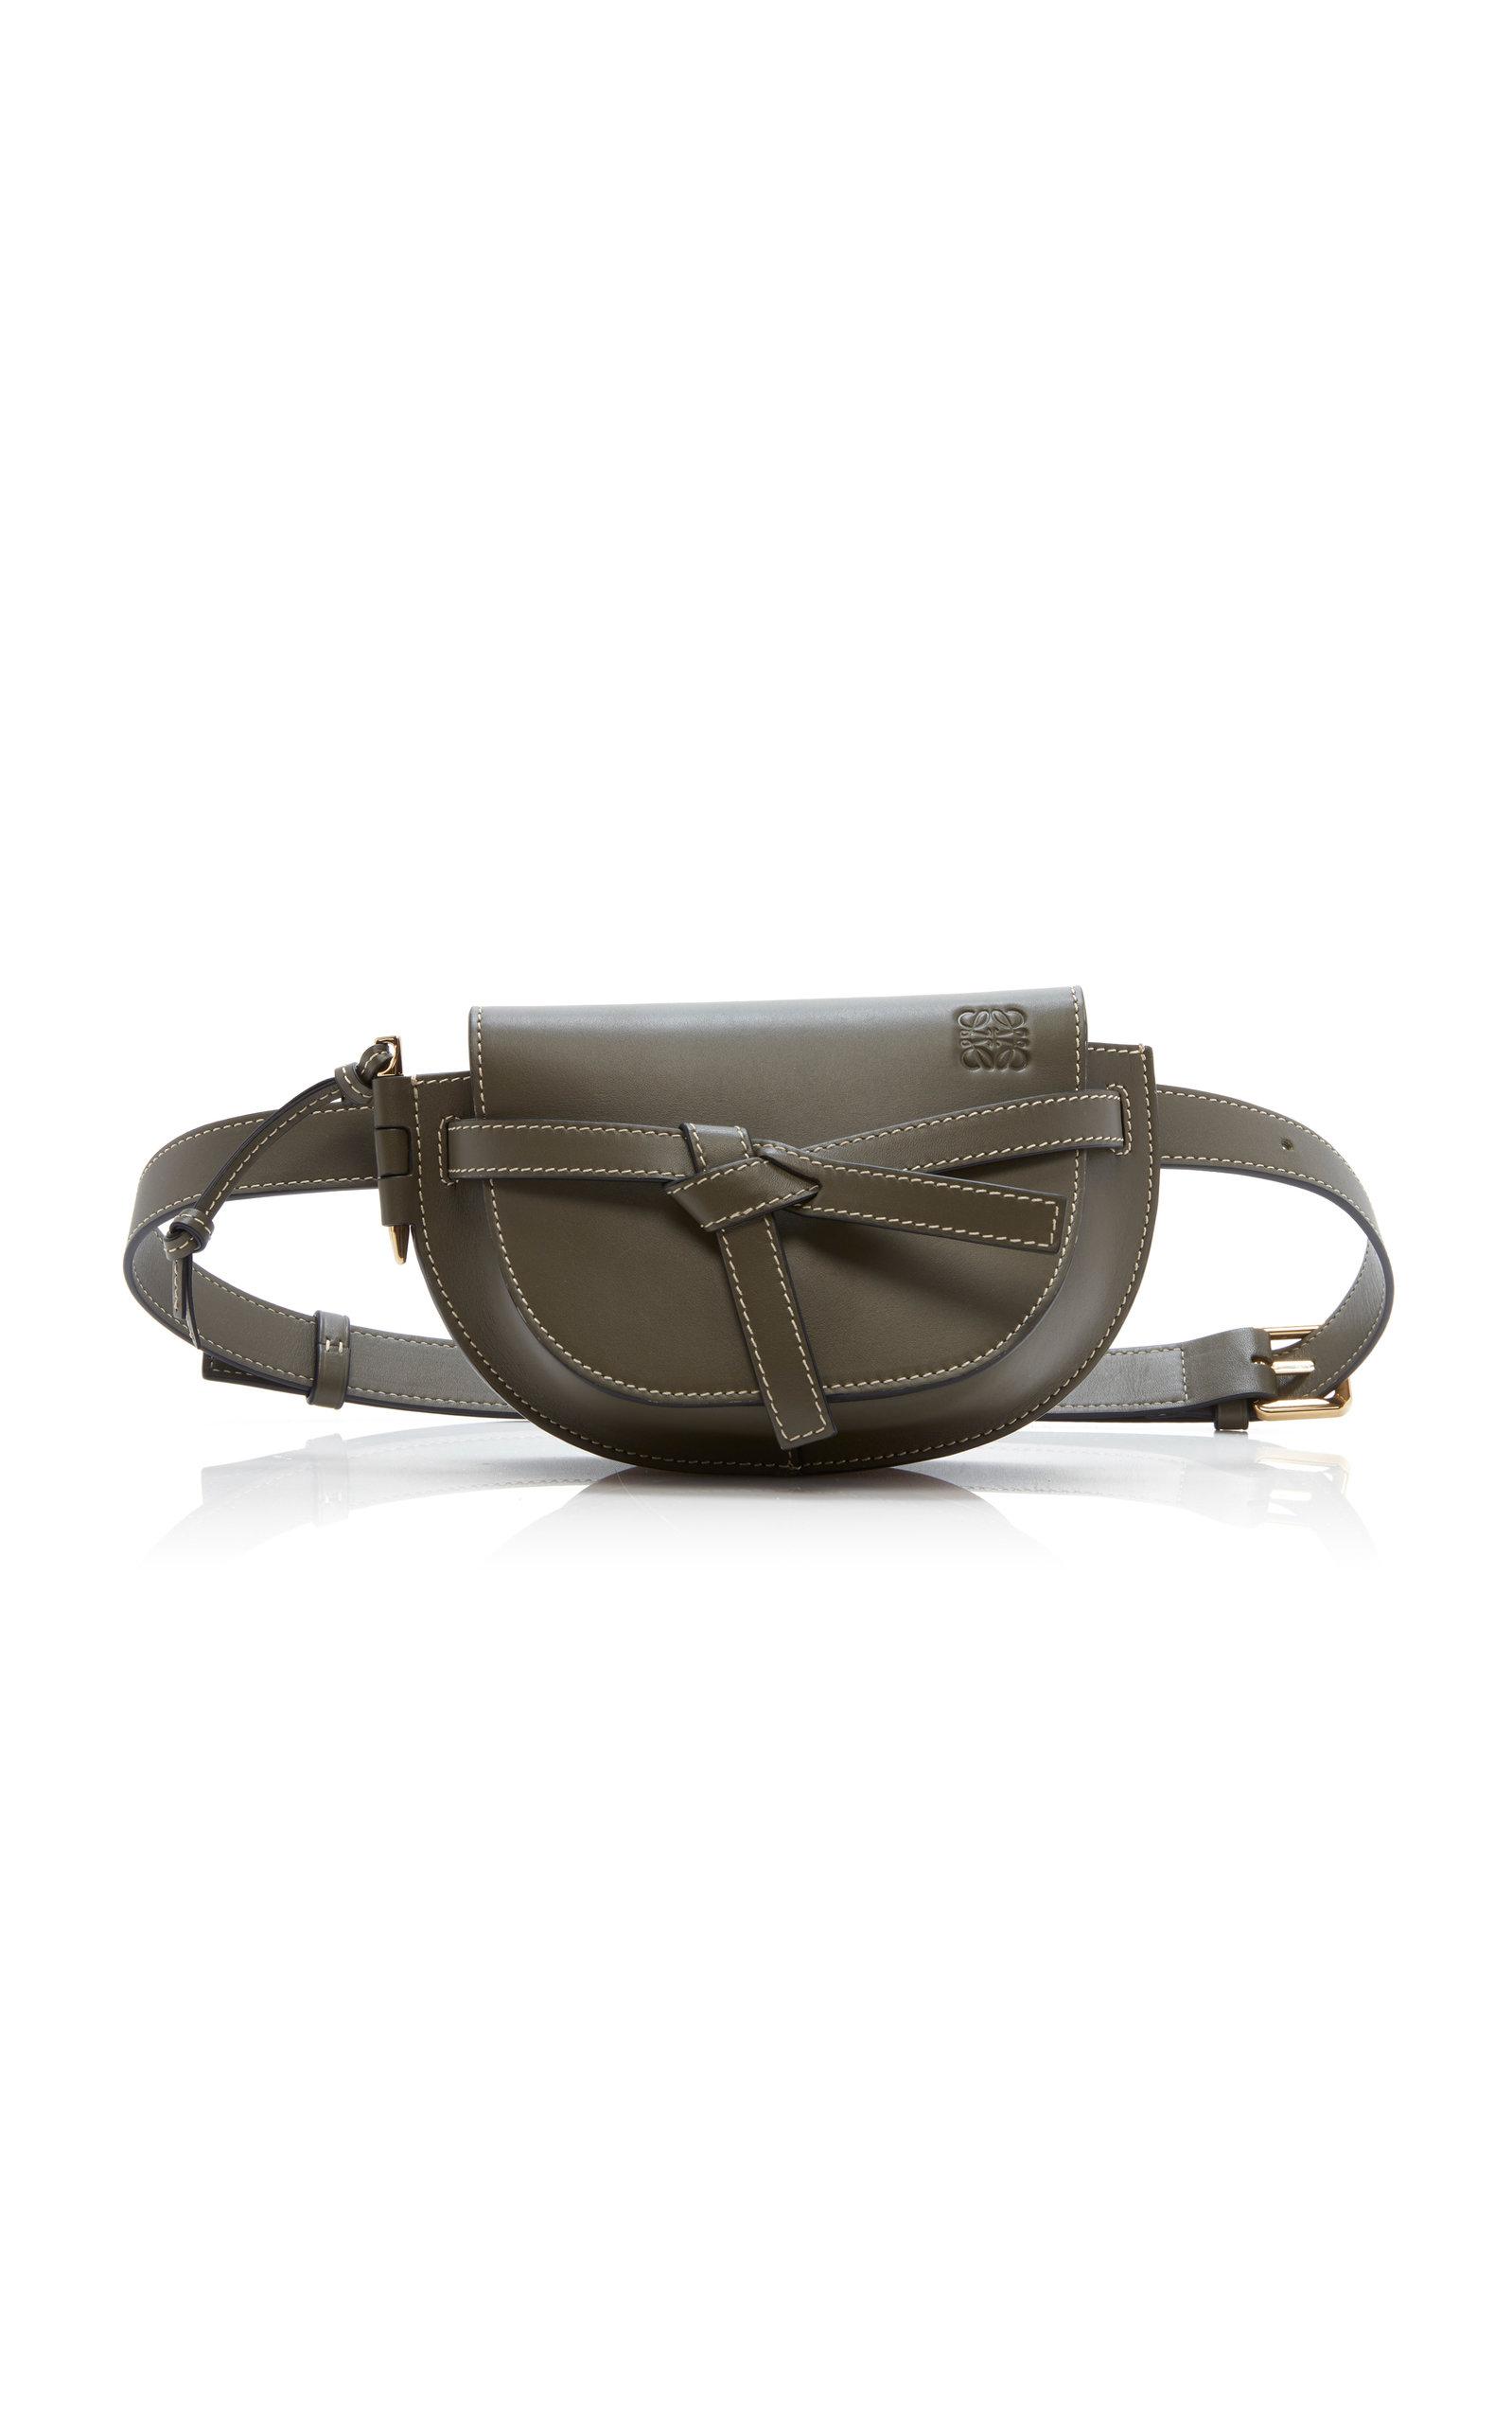 d8e9462bcad3 Gate Leather Bum Bag by Loewe | Moda Operandi